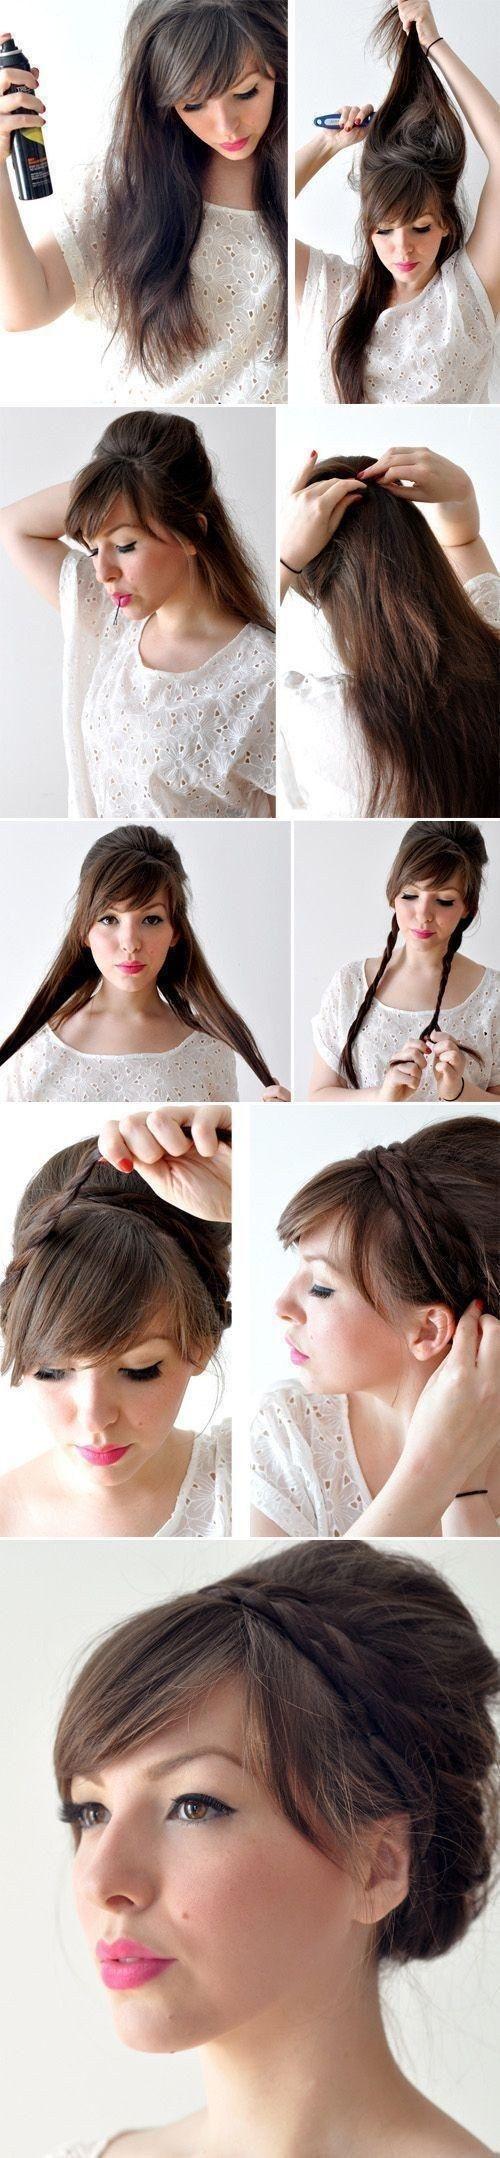 Excellent 1000 Ideas About Disney Princess Hairstyles On Pinterest Disney Short Hairstyles Gunalazisus